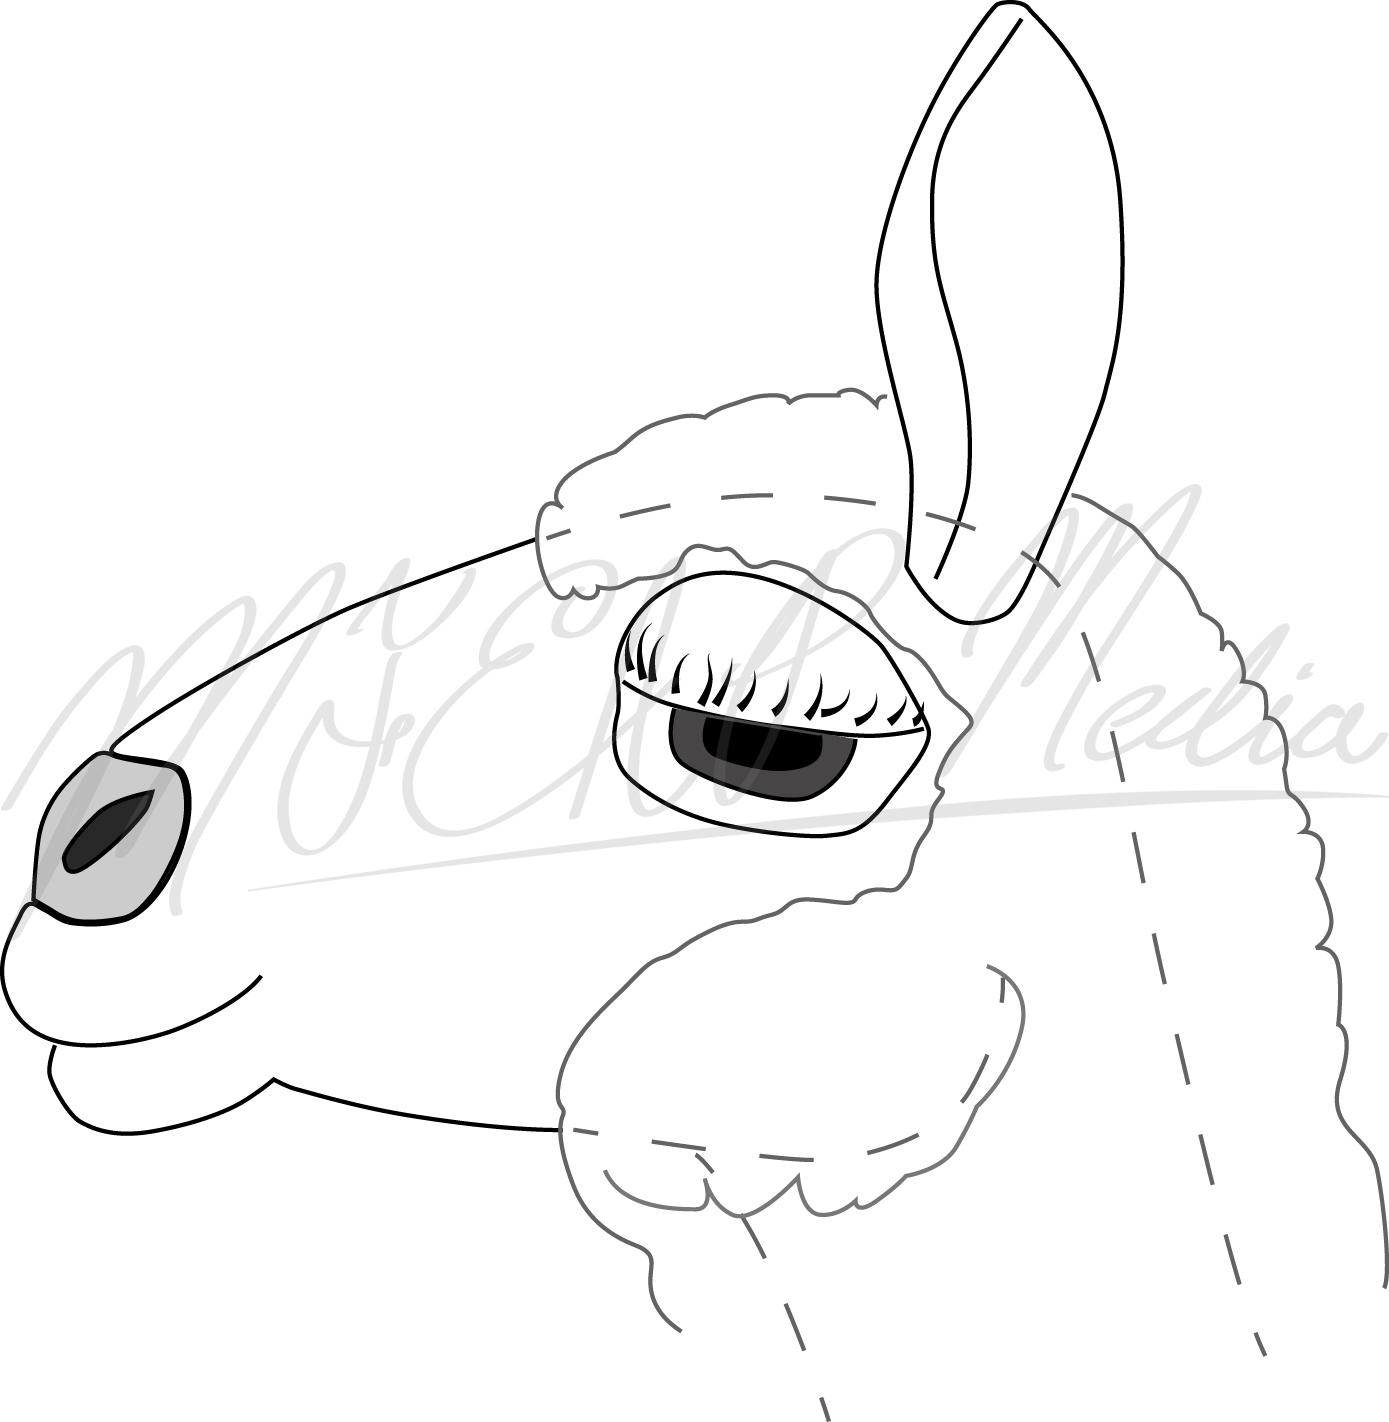 Sheephead.jpg